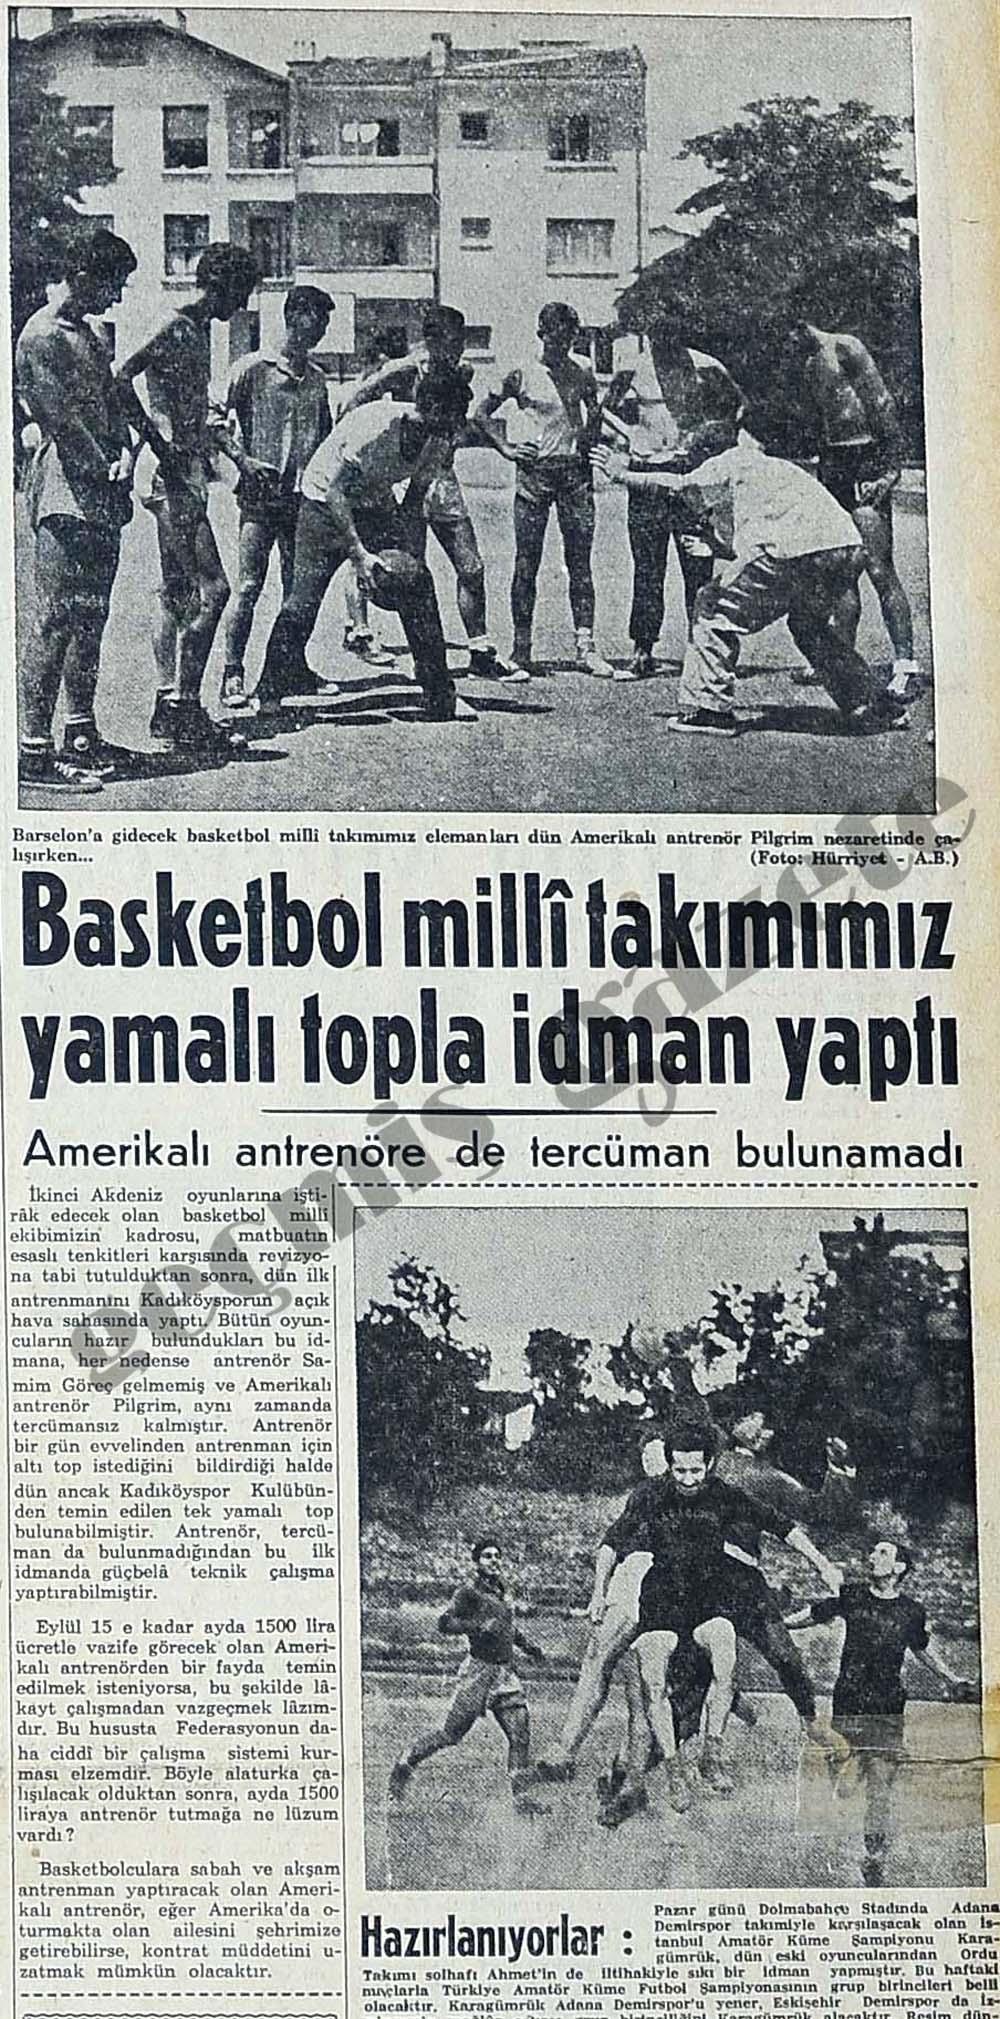 Basketbol milli takımımız yamalı topla idman yaptı